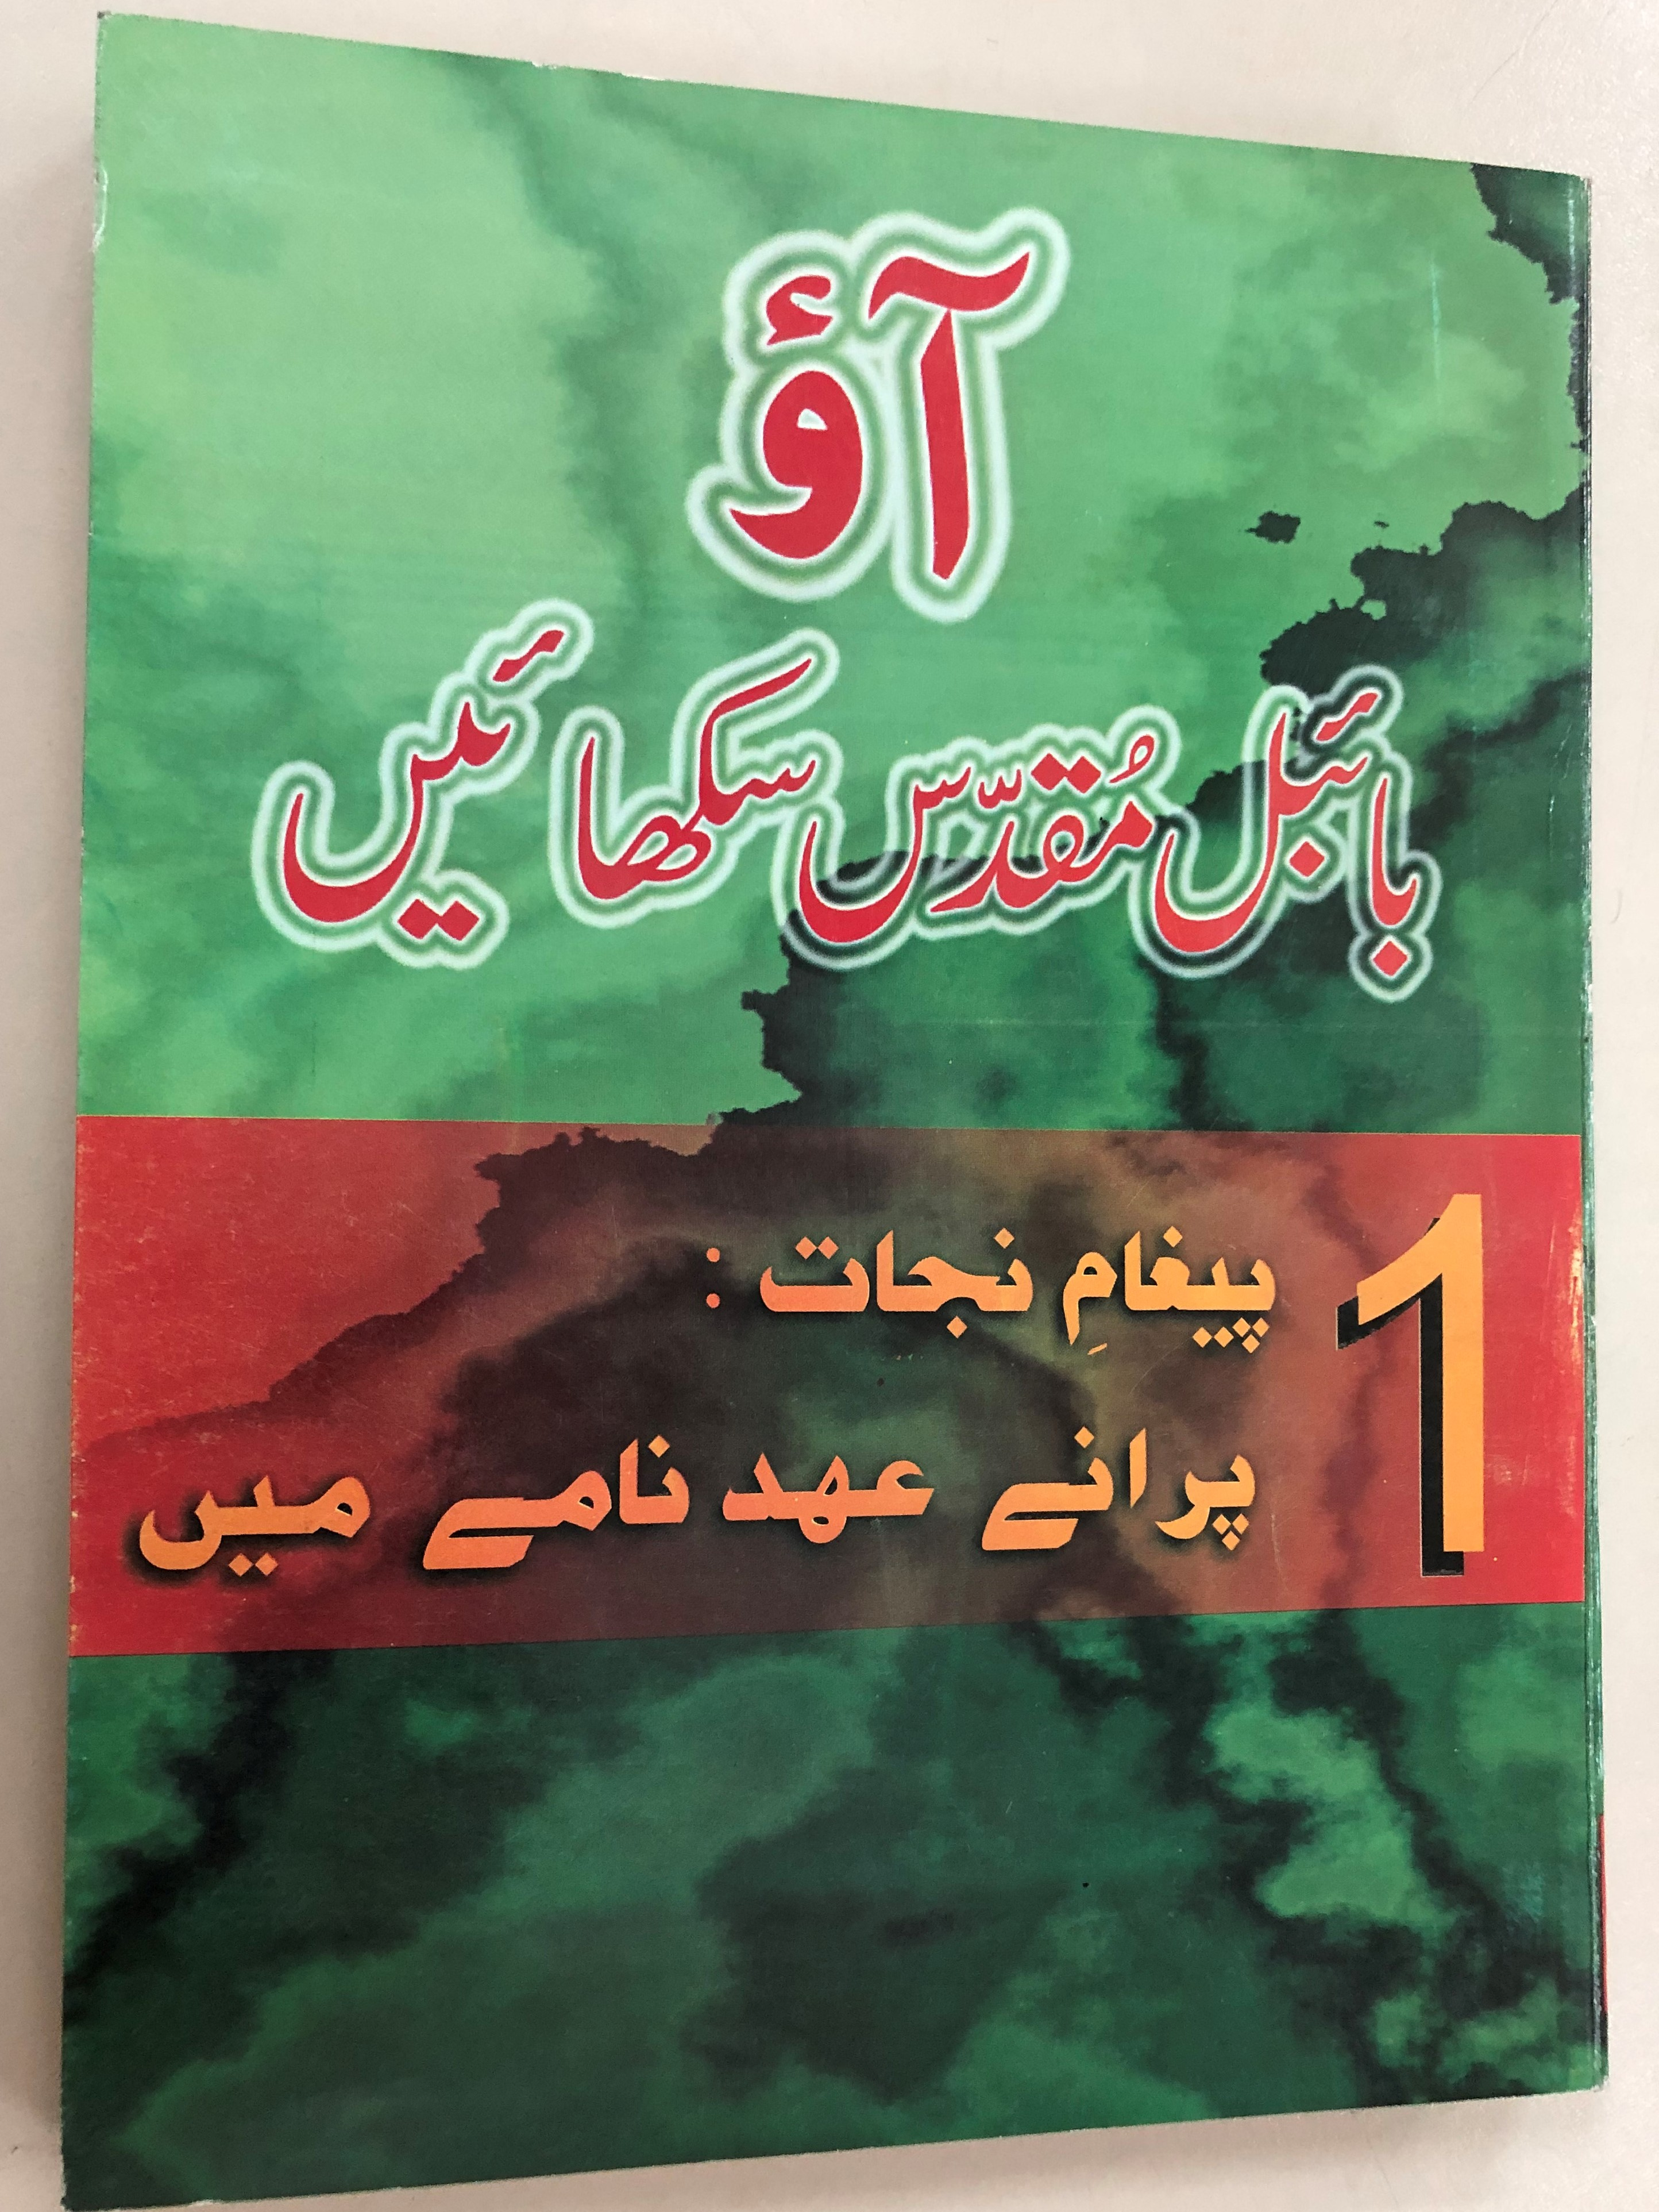 building-on-firm-foundations-vol.1-by-trevor-mcilwain-urdu-edition-evangelism-the-old-testament-pakistan-2007-1-.jpg